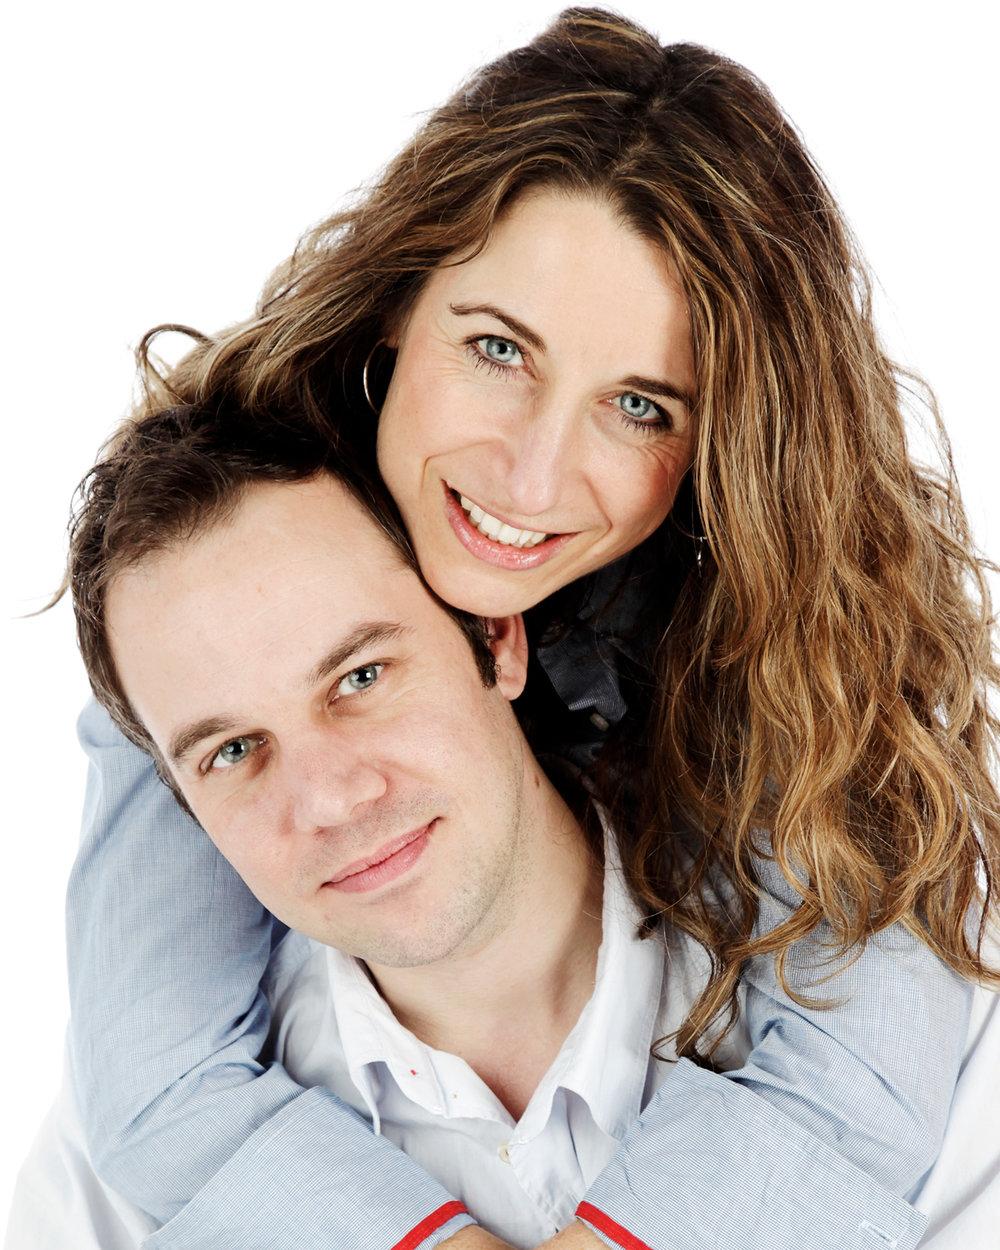 Couple_Adult_Portrait_Photographer_Newbury_Berkshire_004.jpg